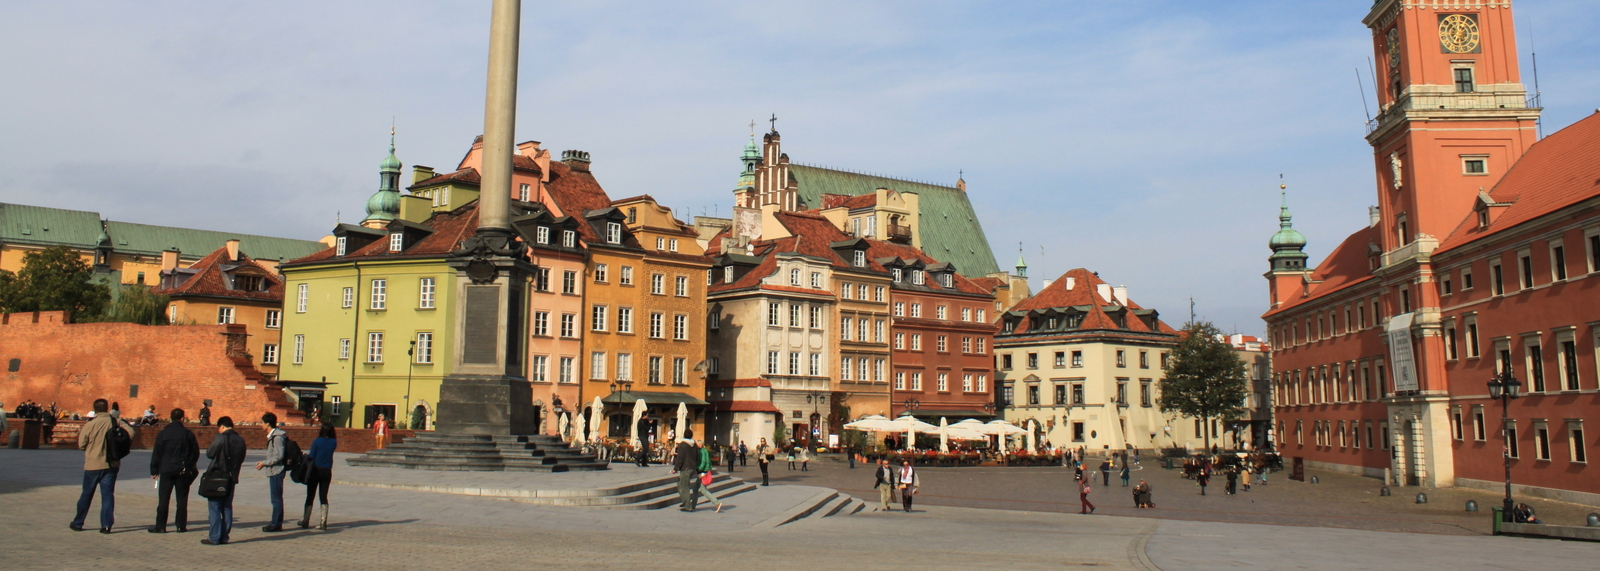 Rynek Starego Miasta, Warschau